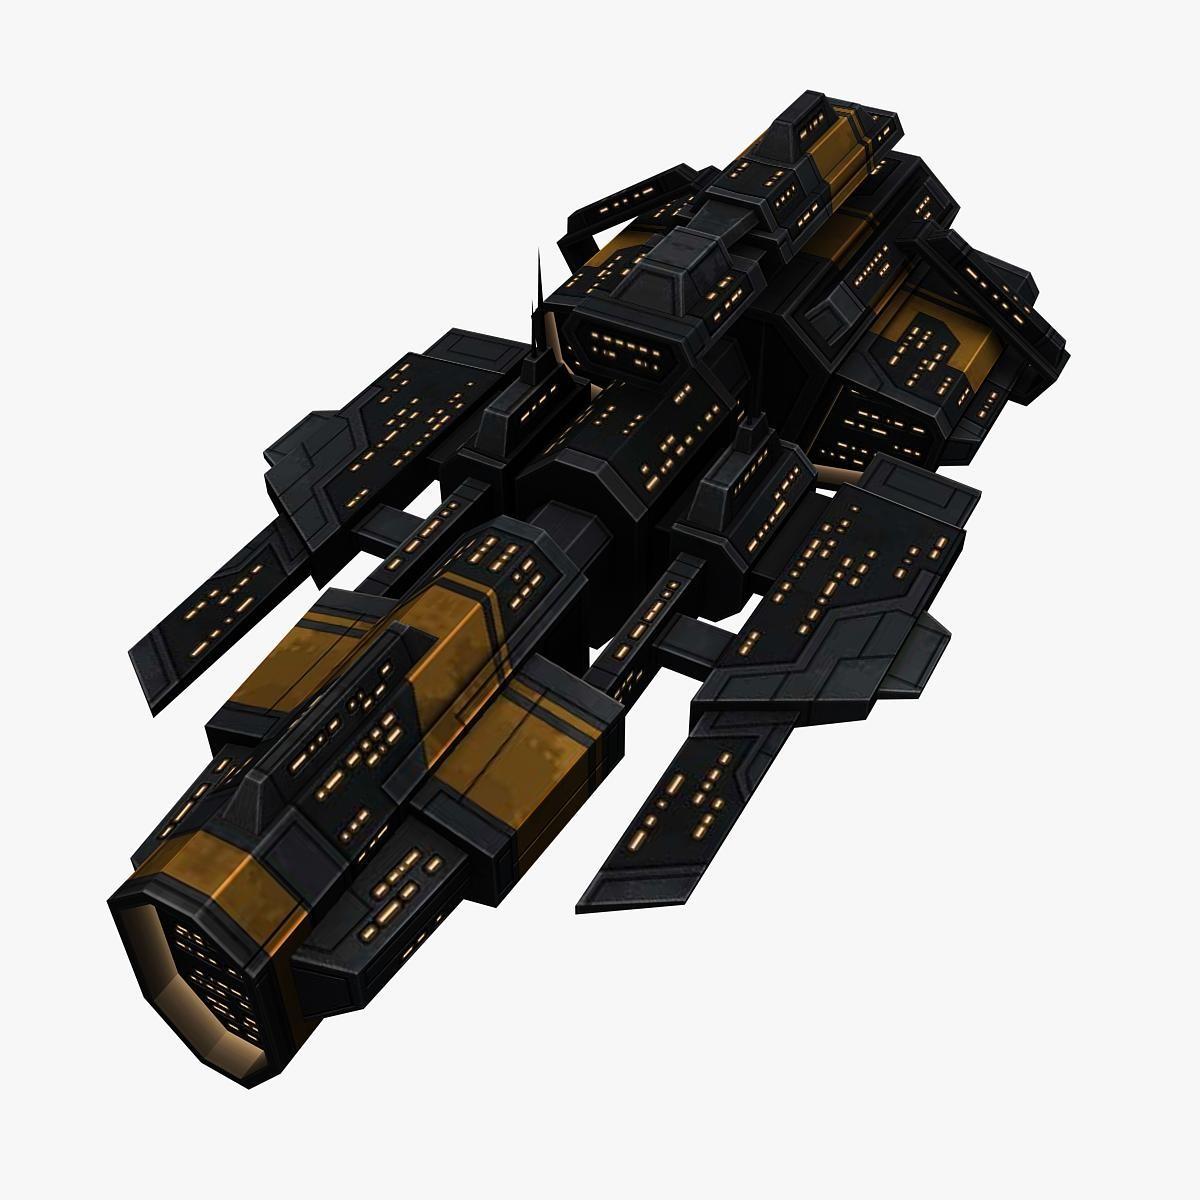 space_battleship_3_preview_0.jpg